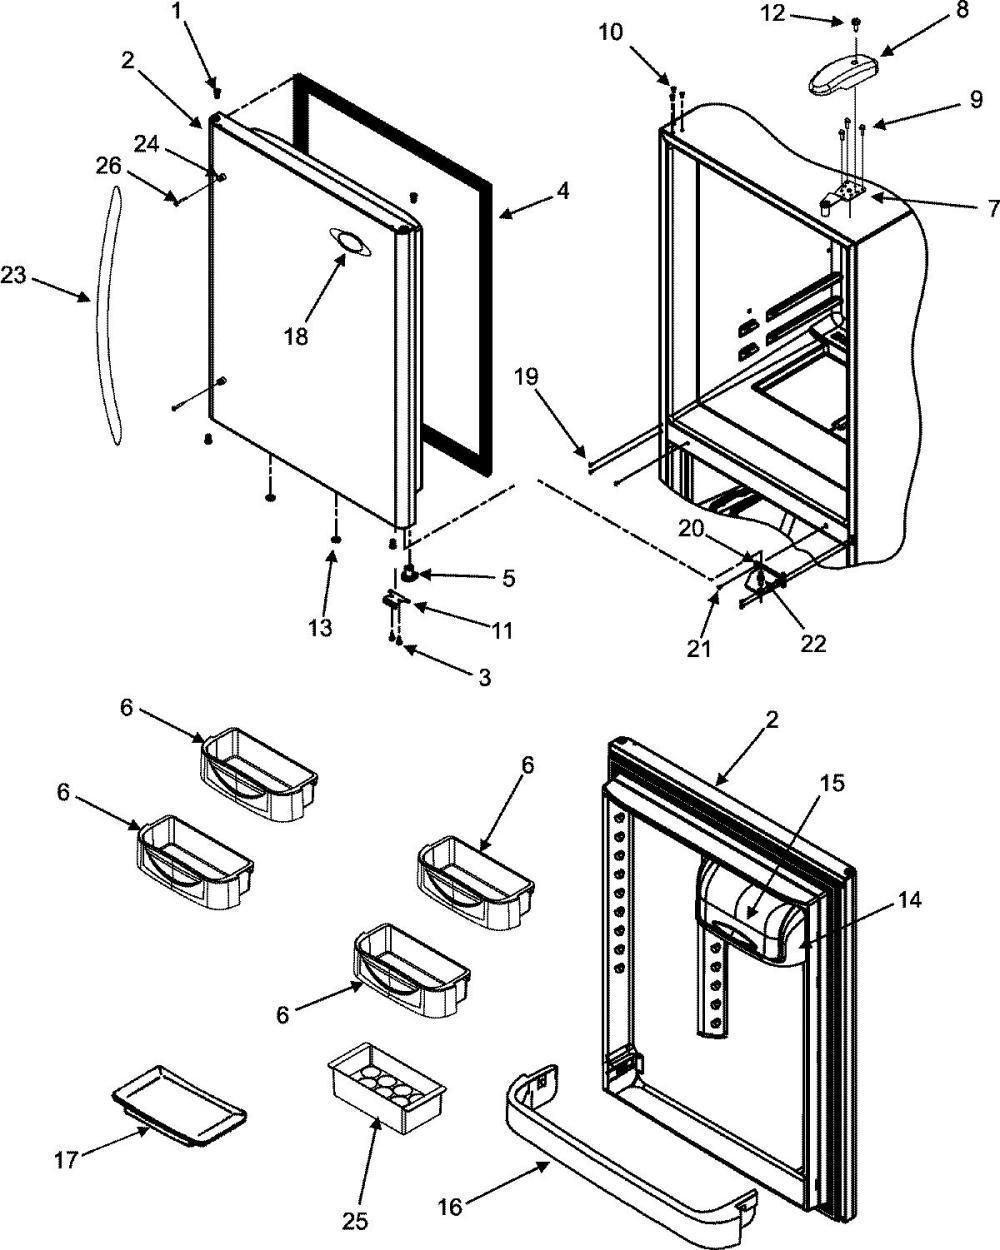 medium resolution of kenmore refrigerator compressor wiring diagram kenmore kenmore freezer parts kenmore 253 upright freezer parts